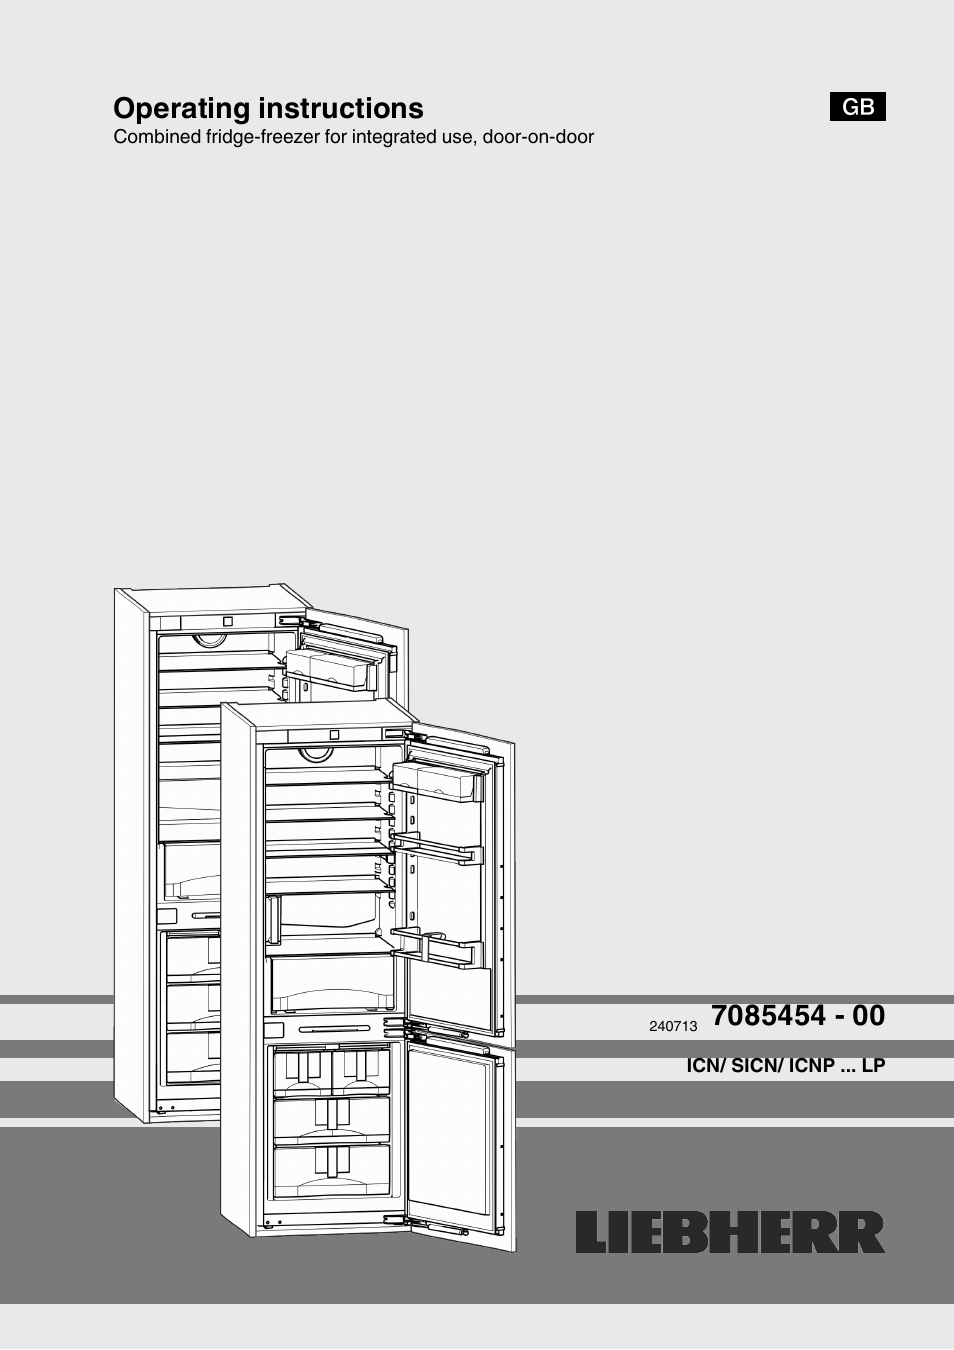 liebherr icn 3366 premium nofrost user manual 12 pages rh manualsdir com Liebert Appliances liebherr refrigerator user manual